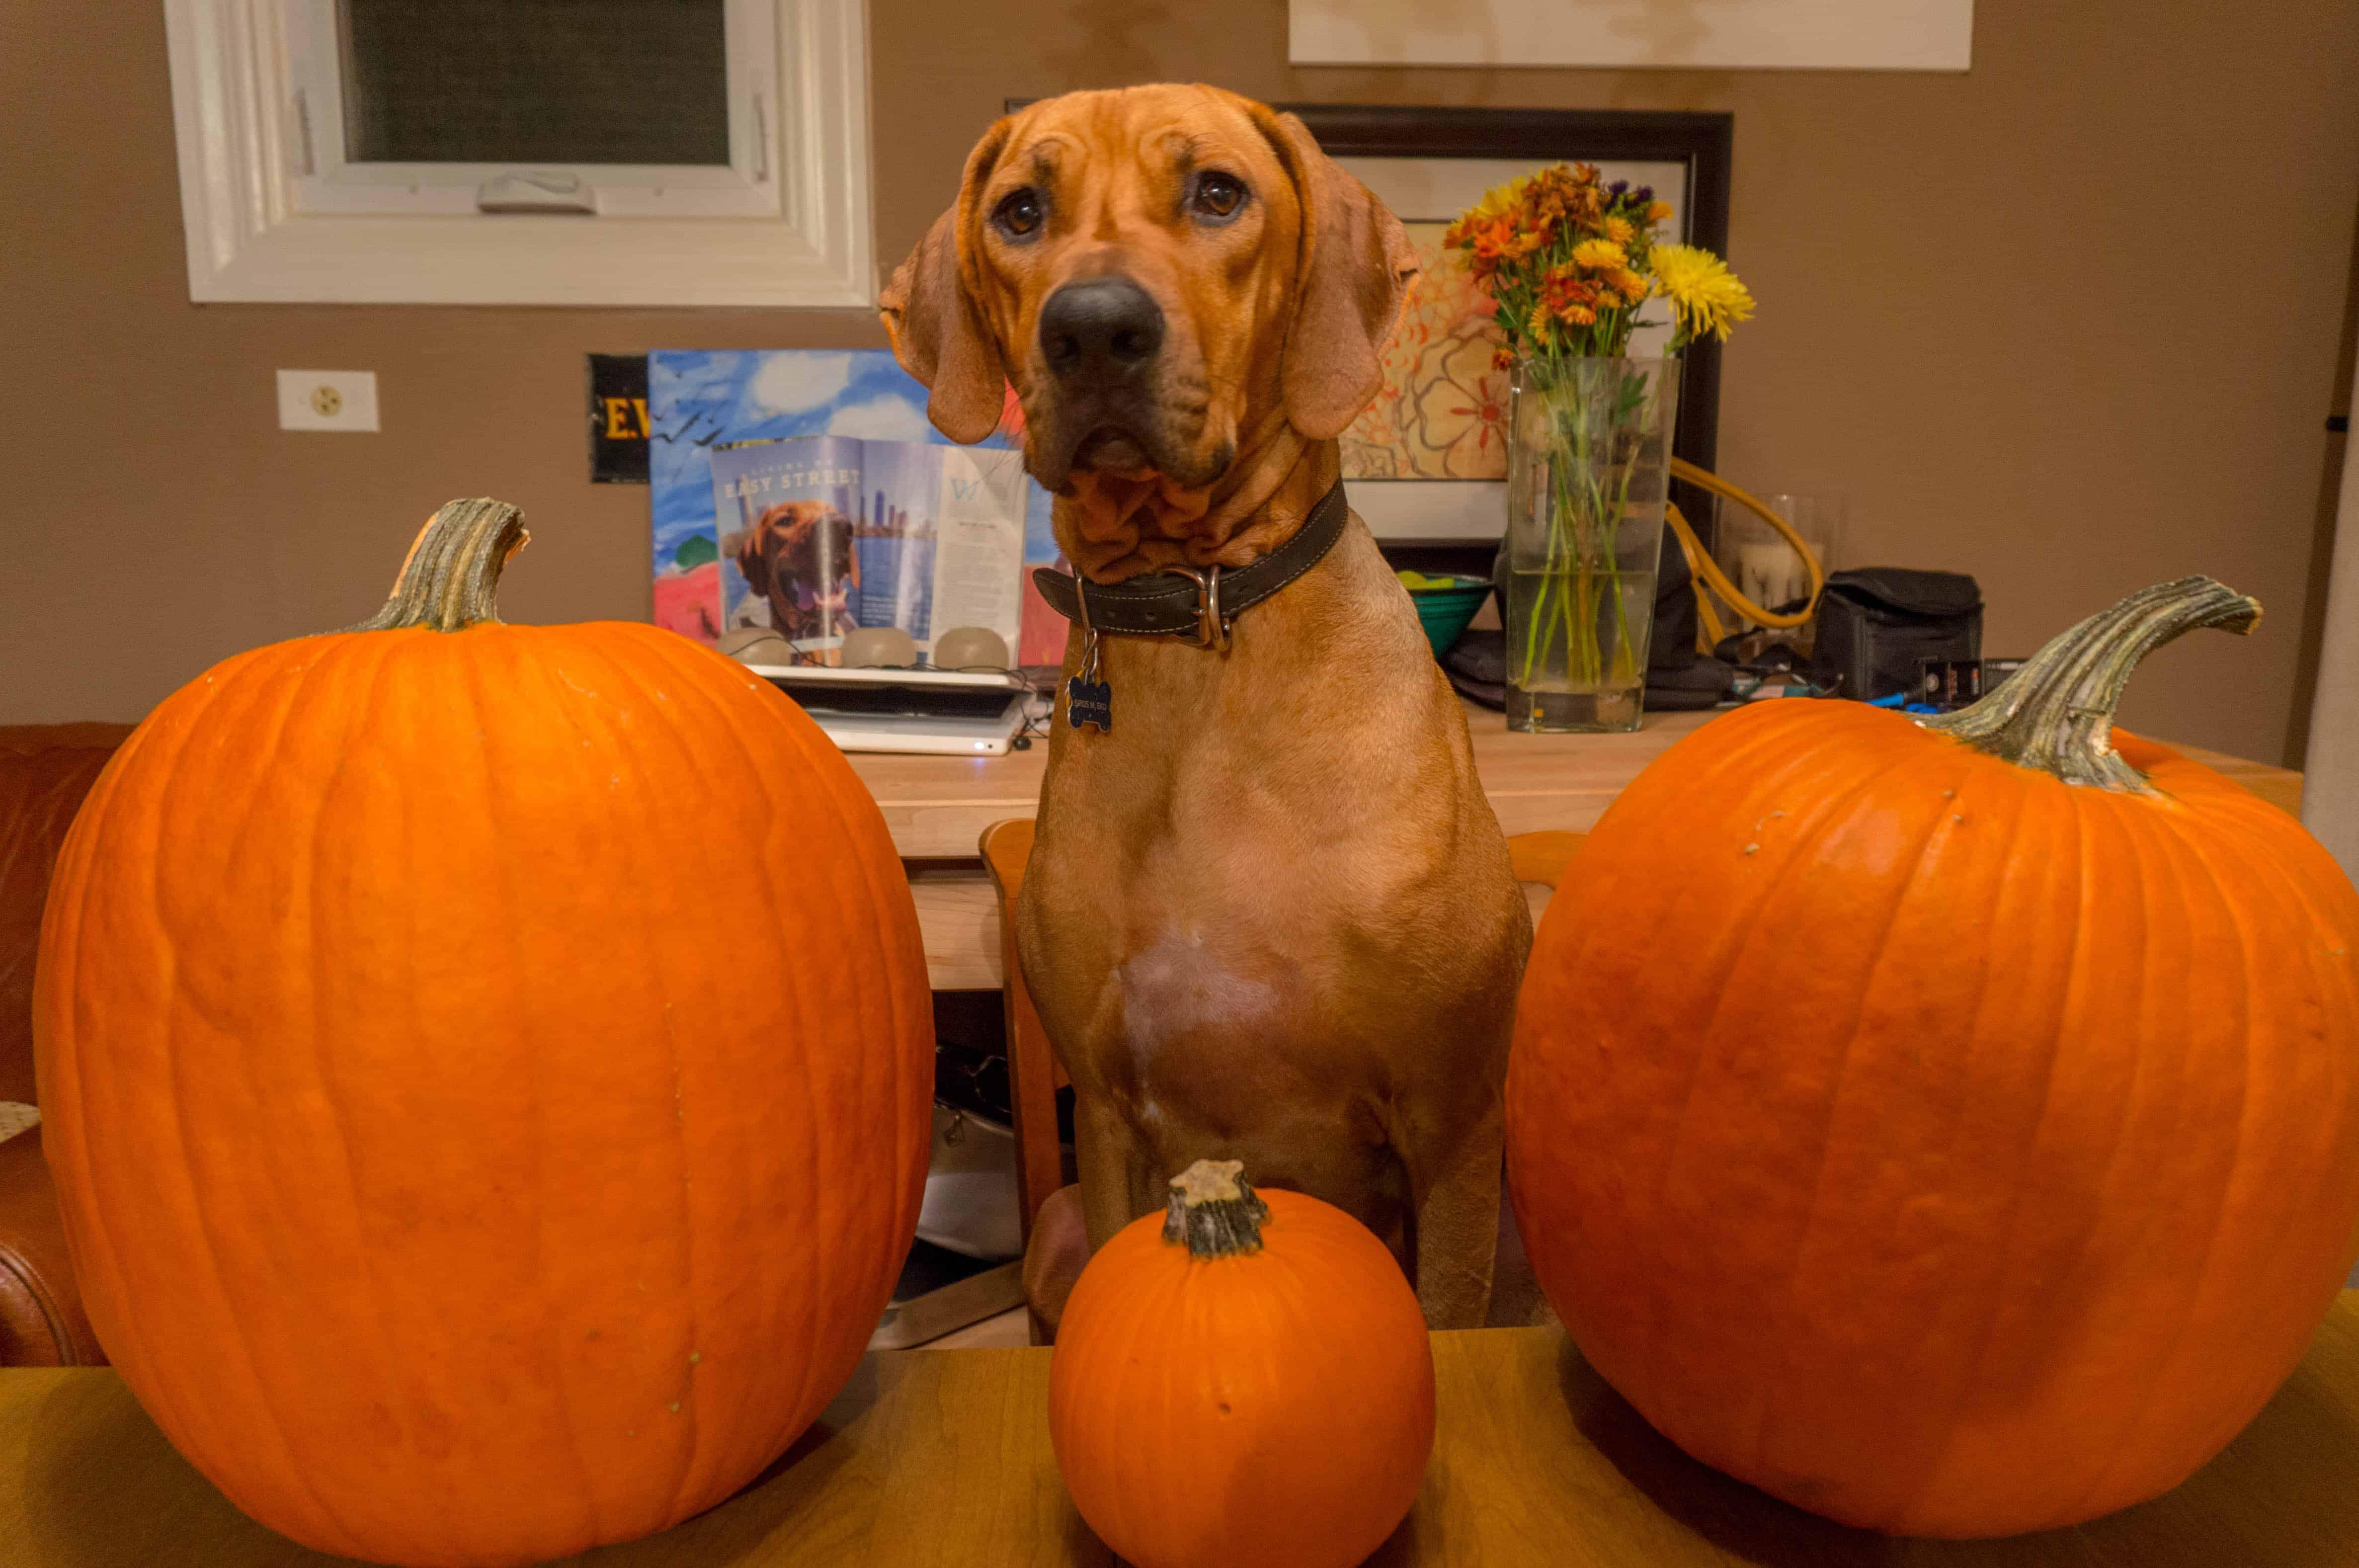 Rhodesian Ridgeback, adventure, pumpkin, dogs, marking our territory, chicago